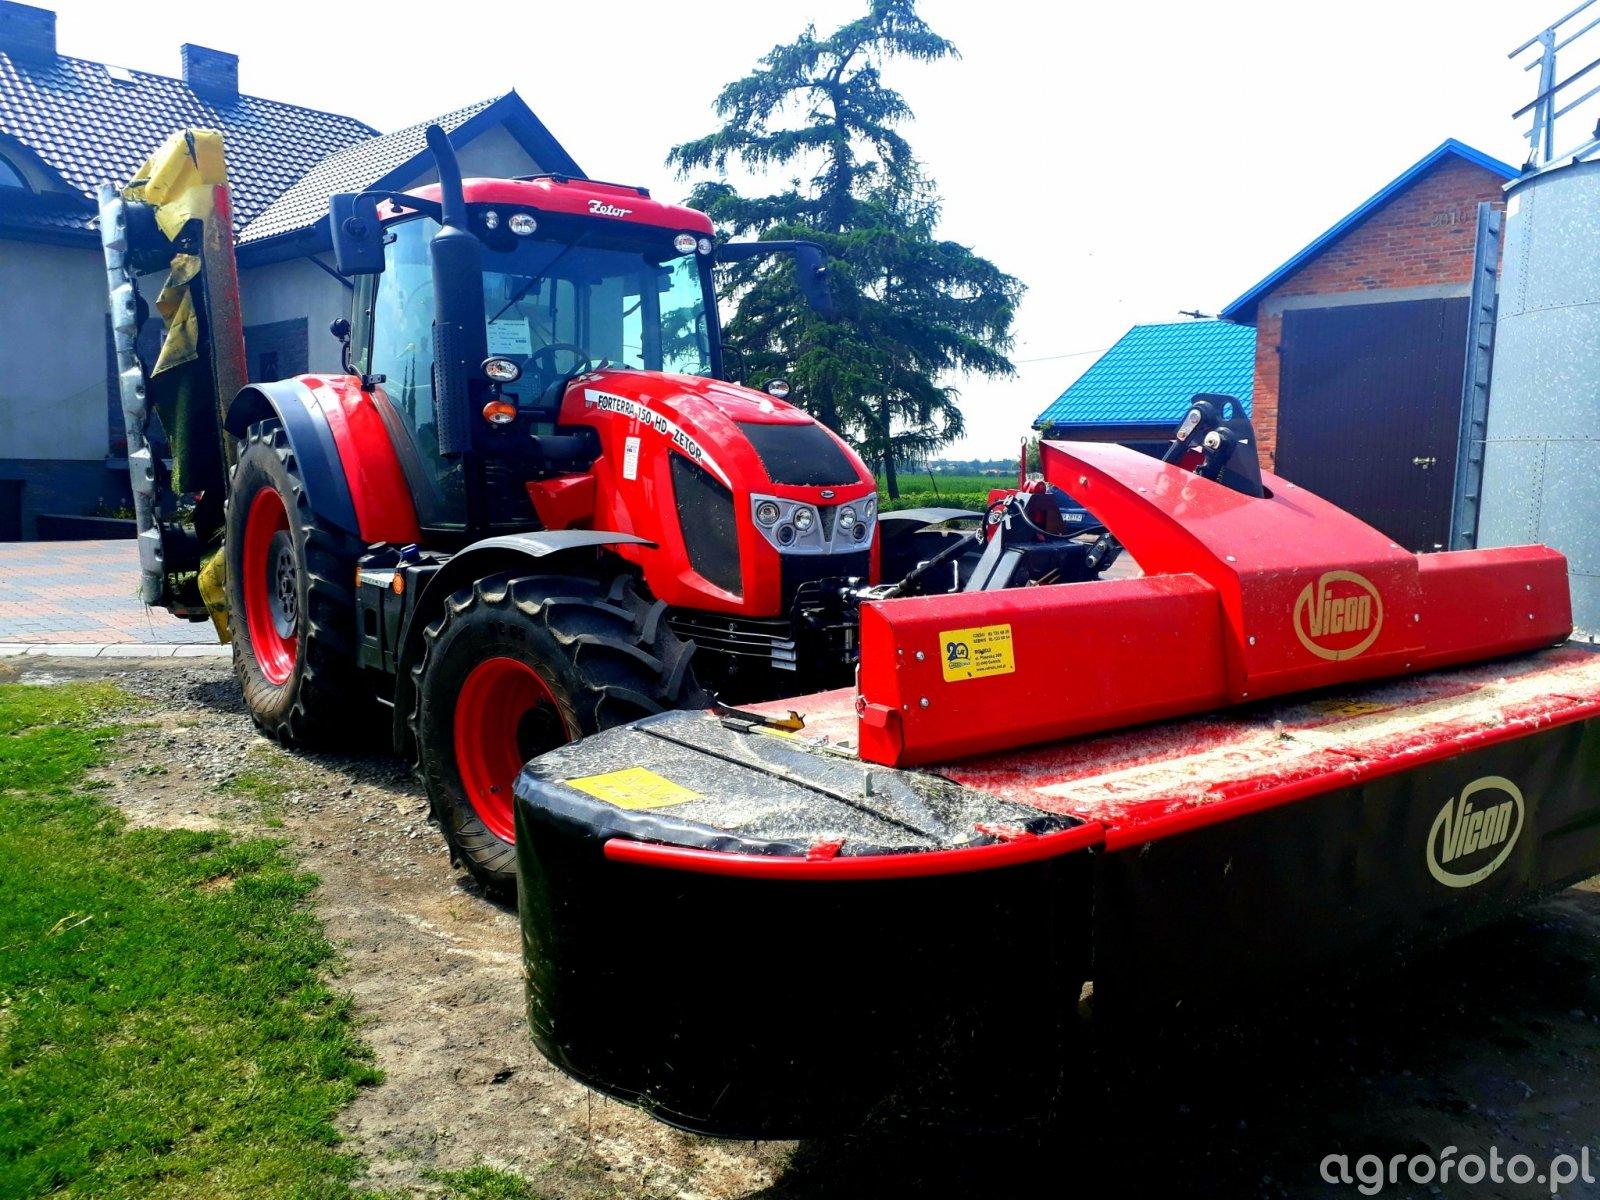 Vicon Extra 332 XF & Fella SM 270 & Zetor Forterra 150 16V